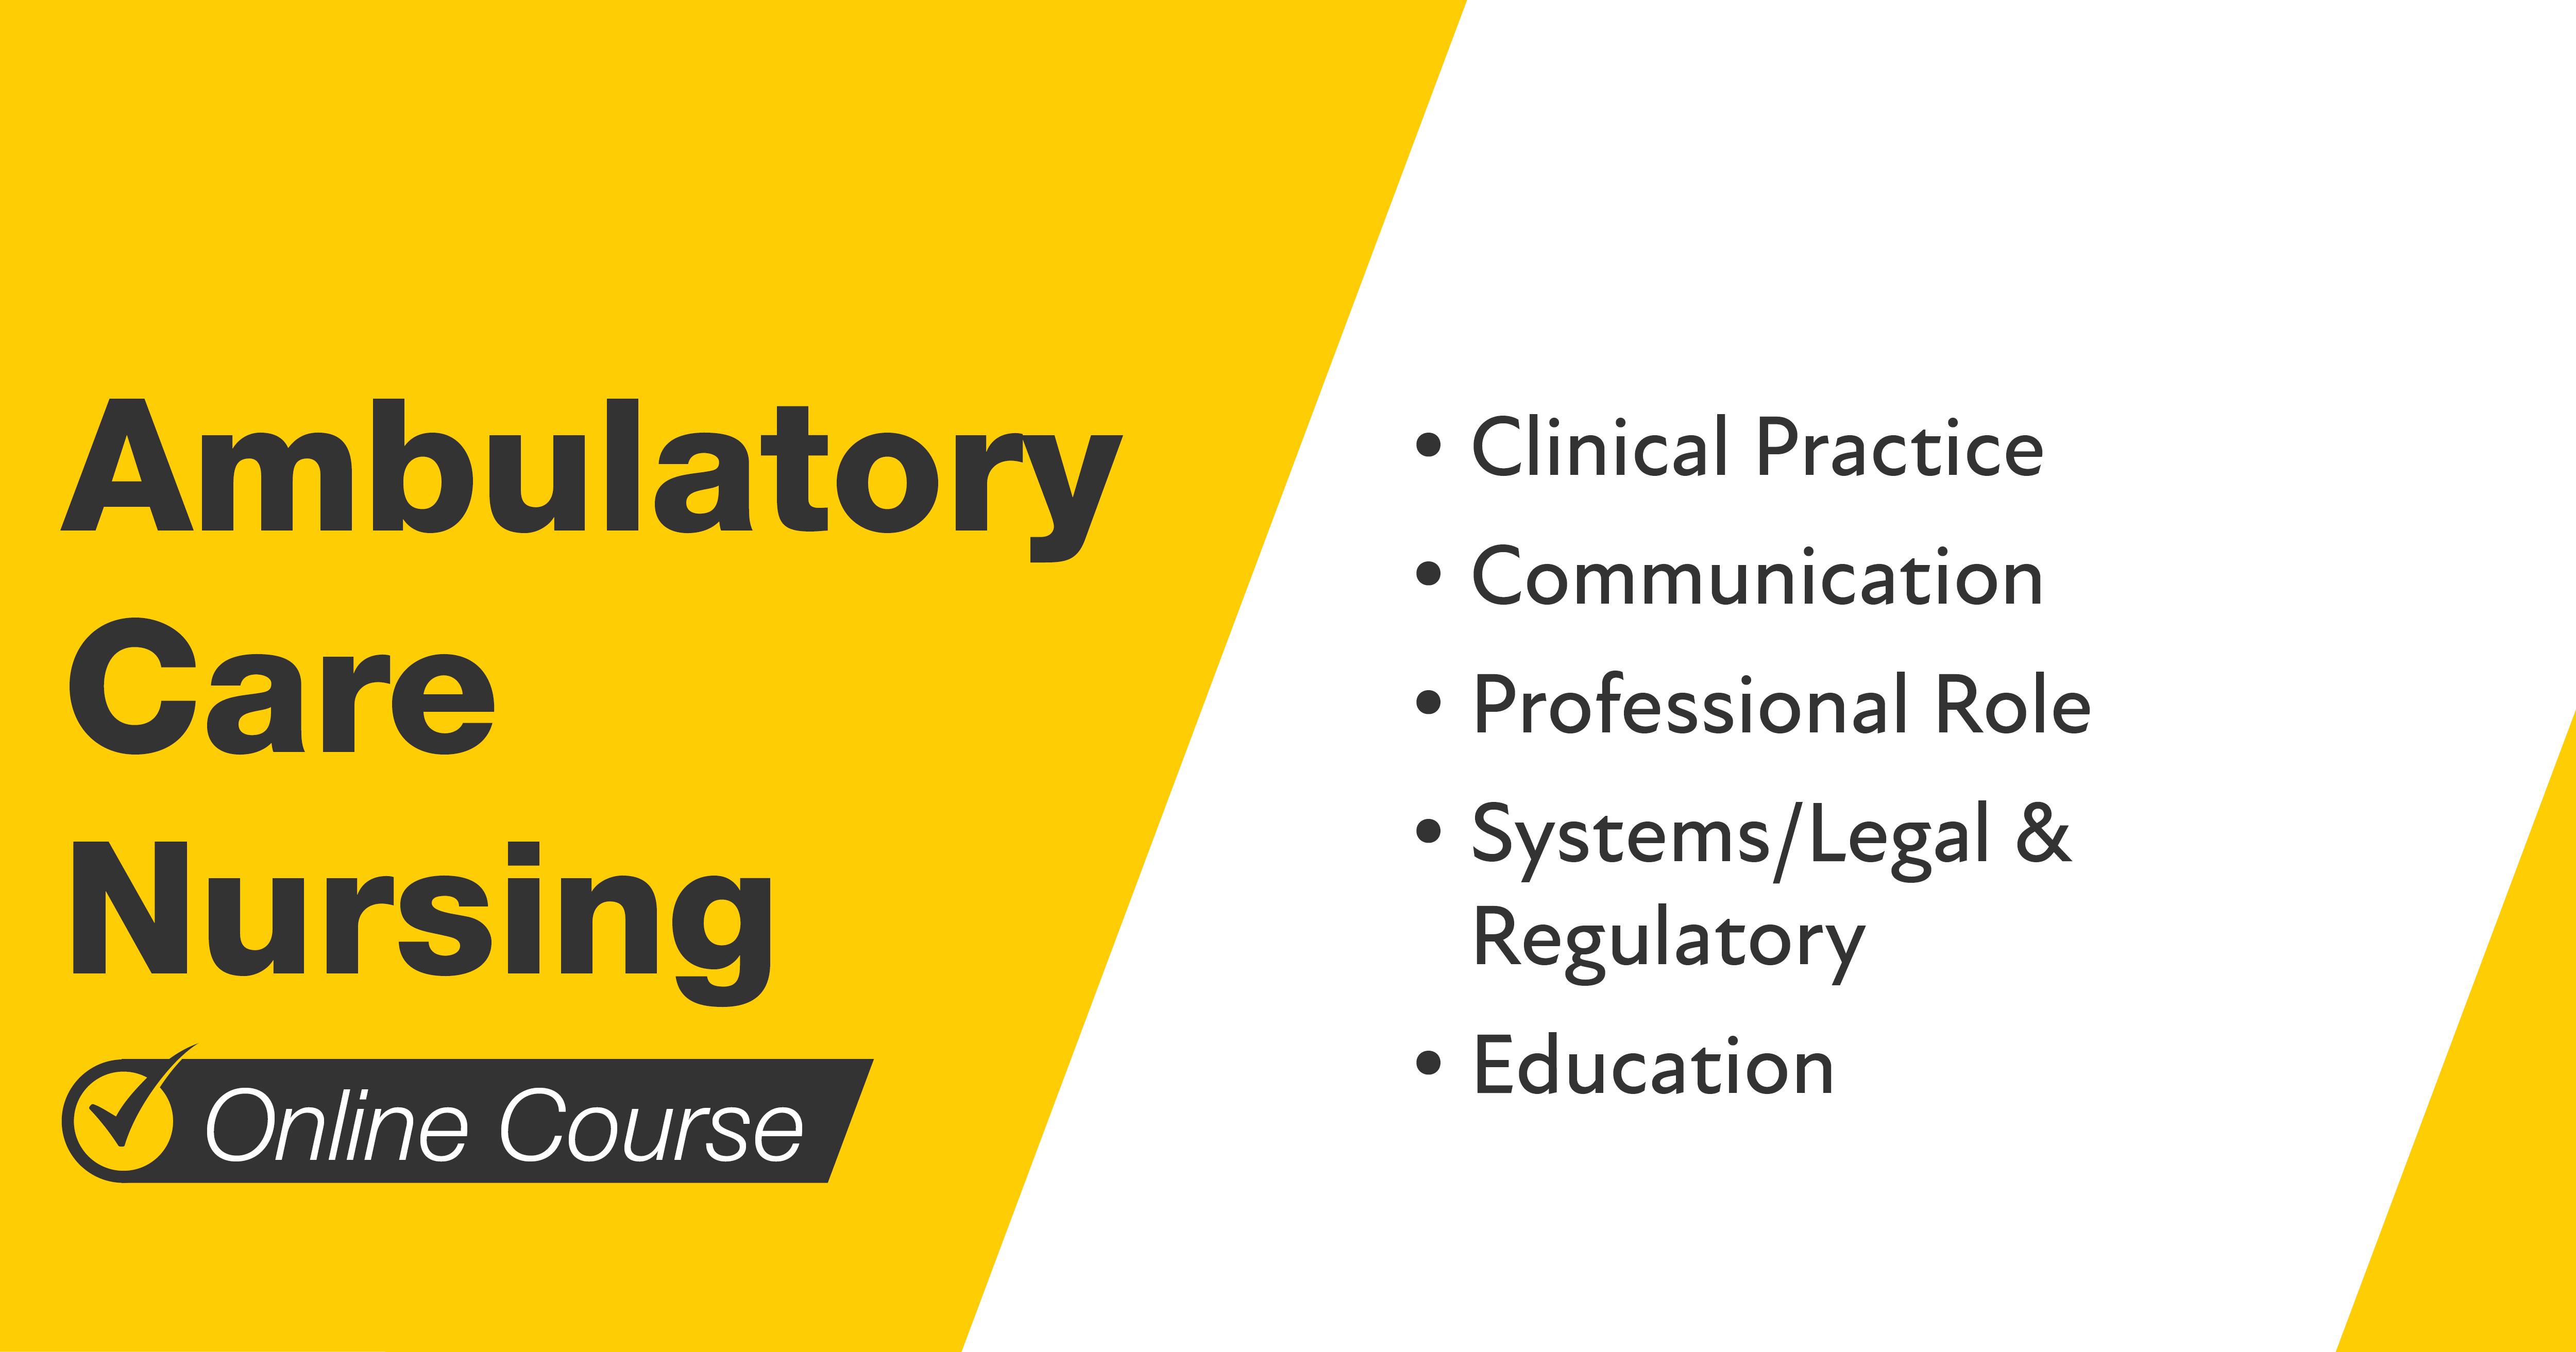 Ambulatory Care Nursing Online Course